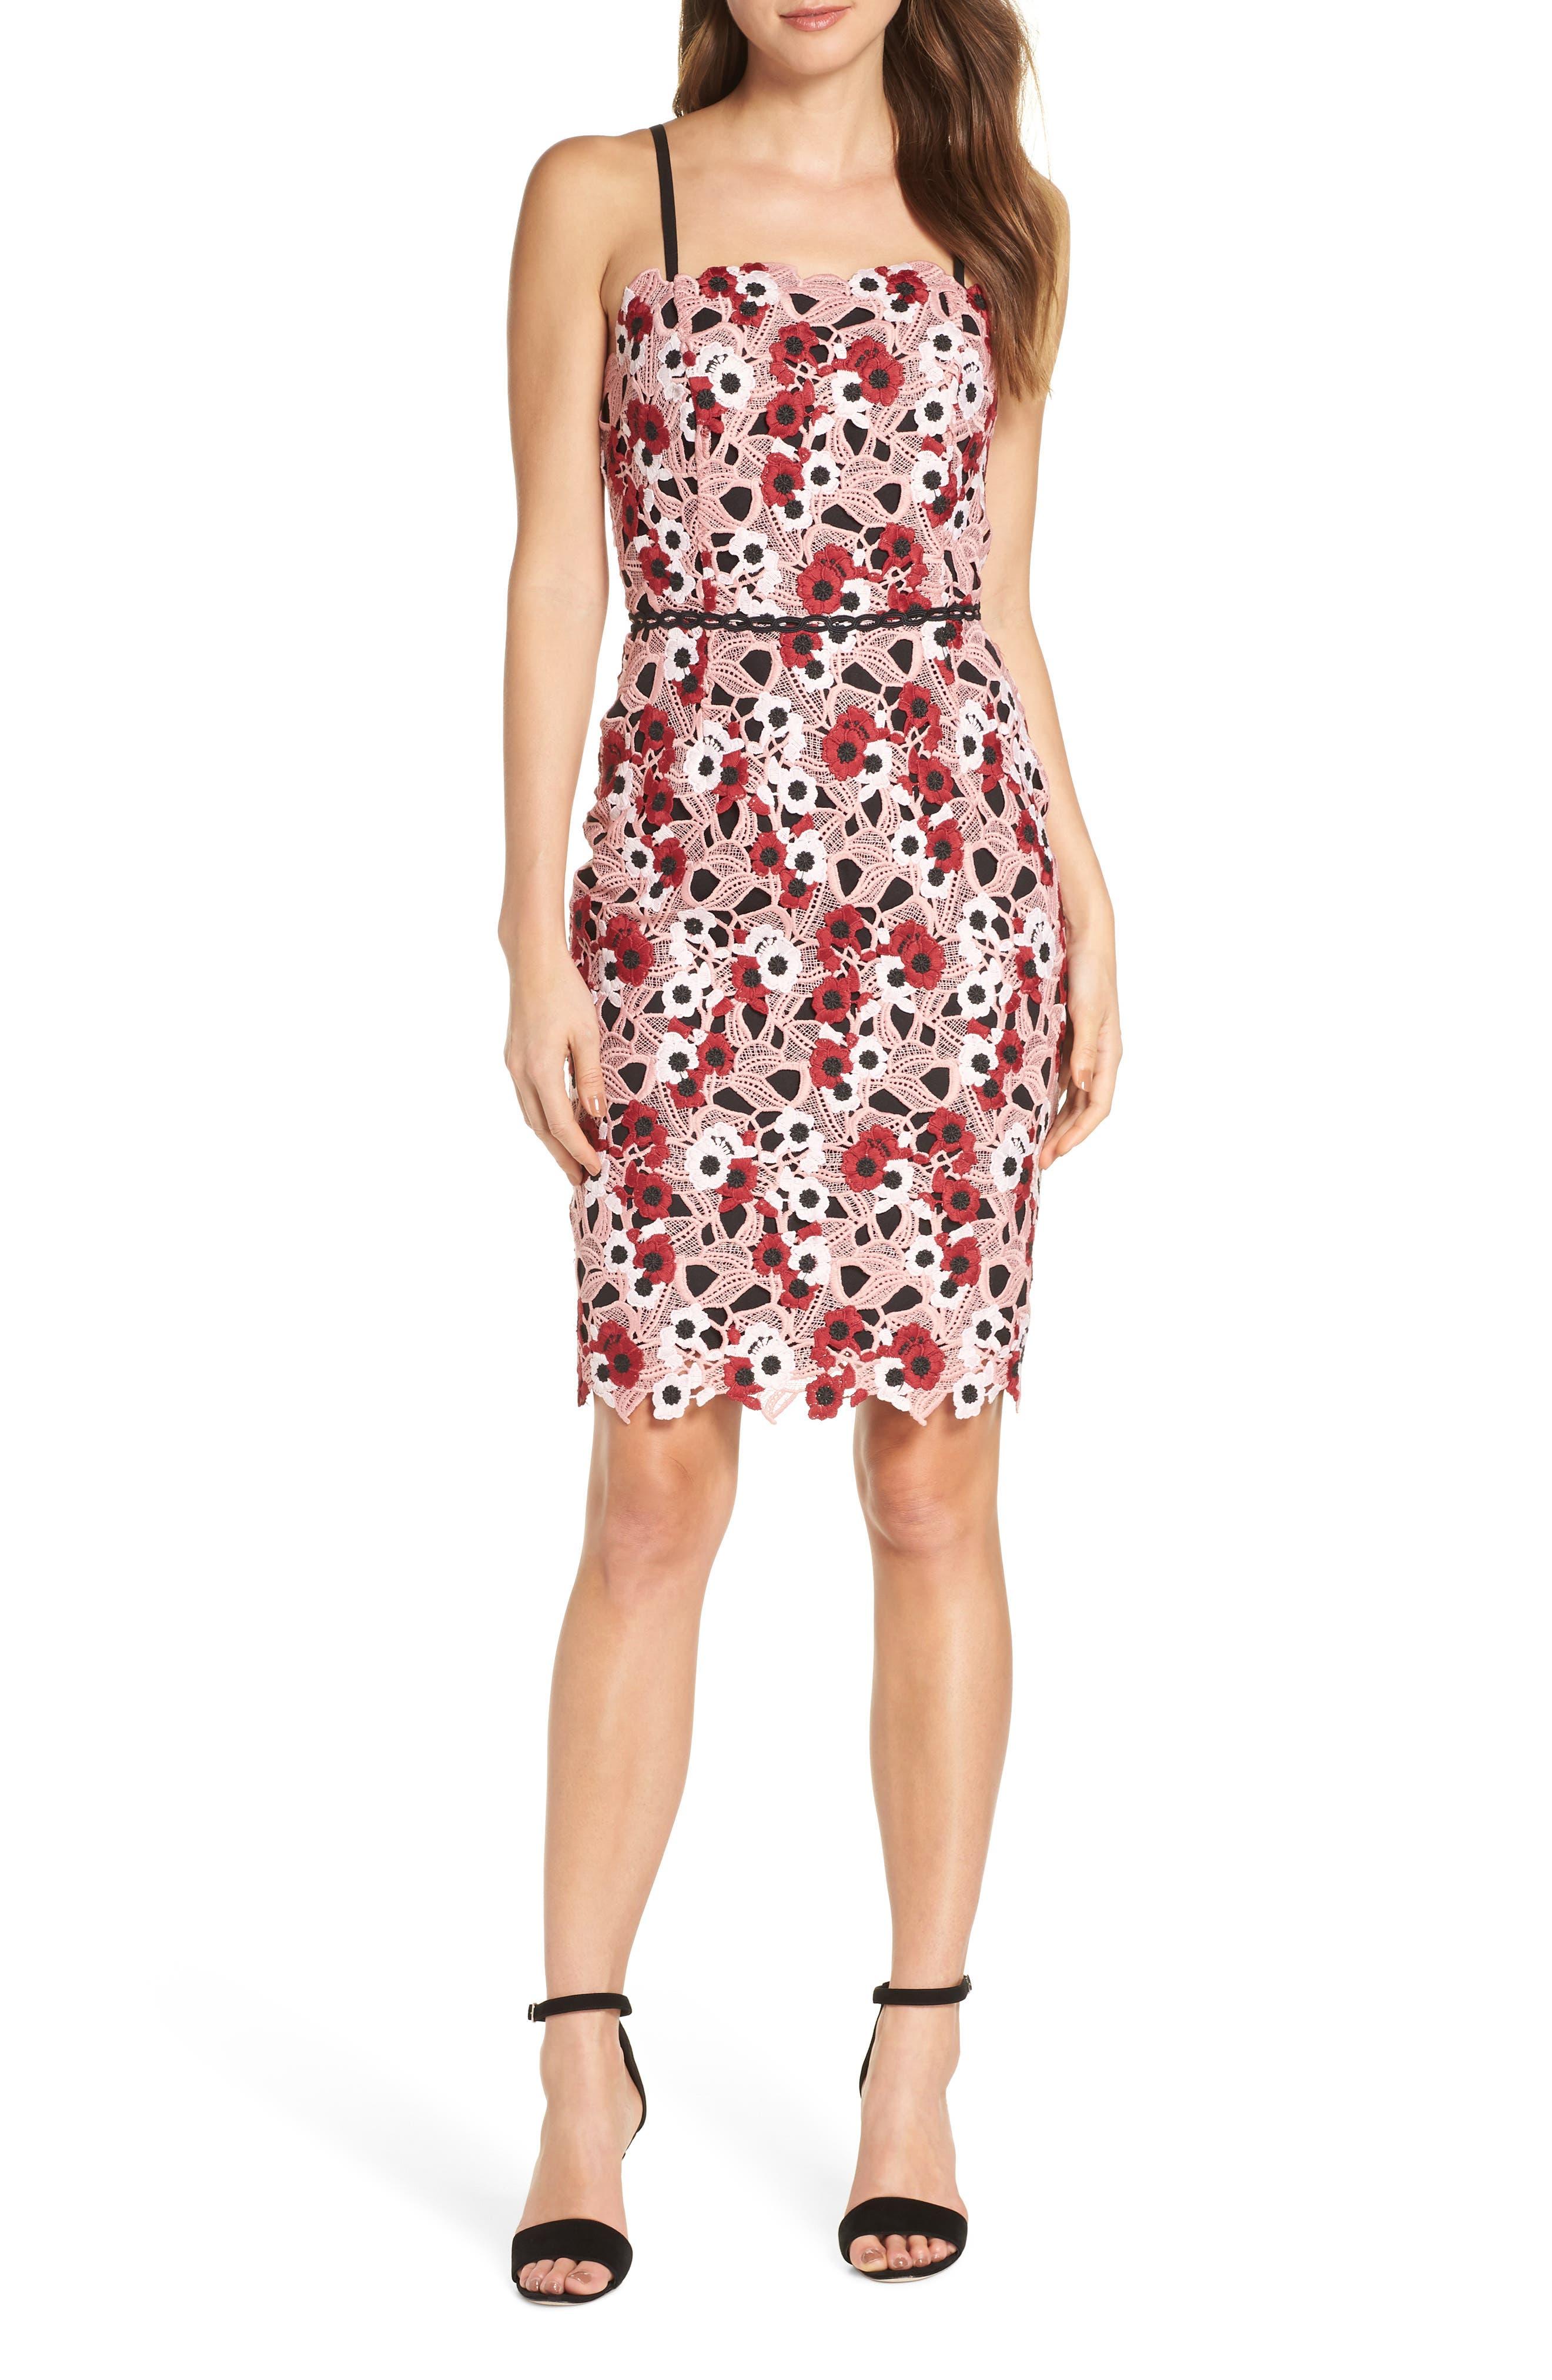 Adelyn Rae Harlow Lace Sheath Dress, Pink